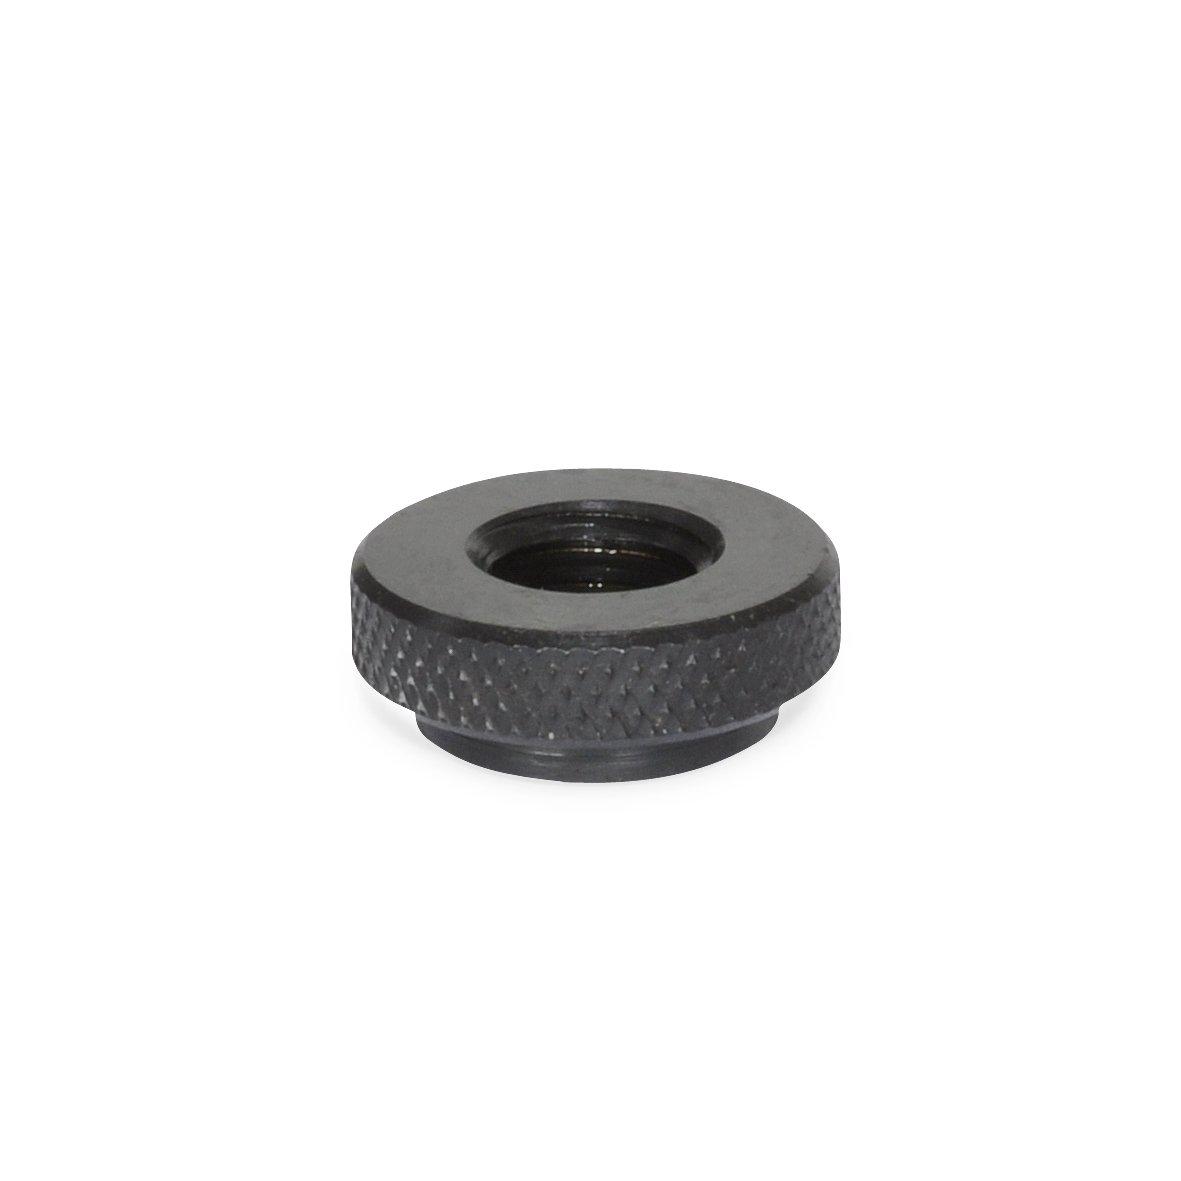 Winco L03-5322 CN Check Nut 1//4-20 Thread J.W Steel